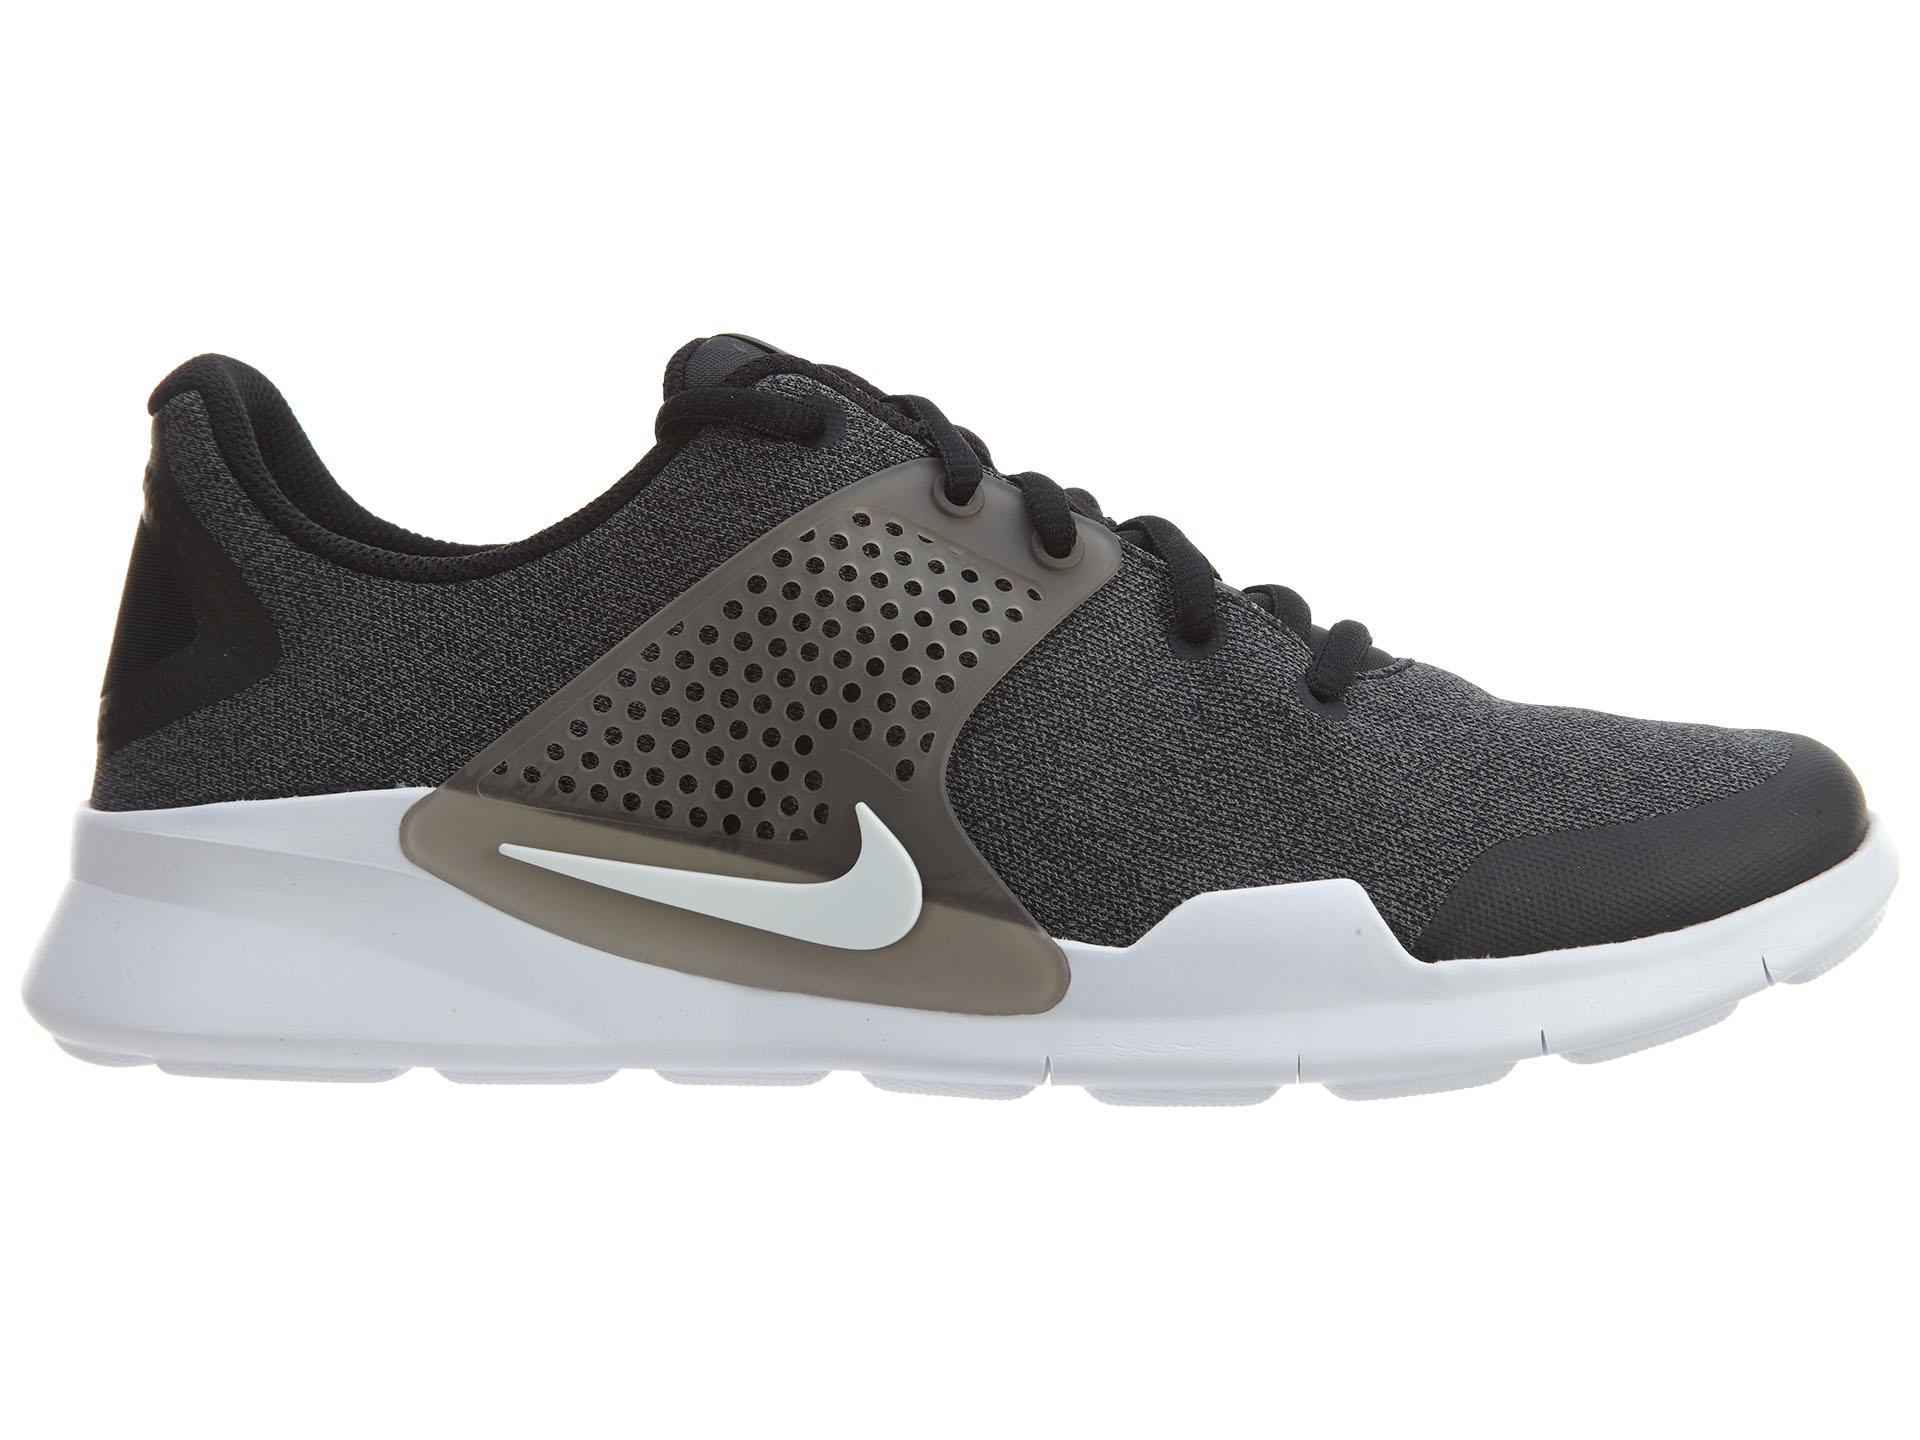 Nike Arrowz Black/White-Dark Grey